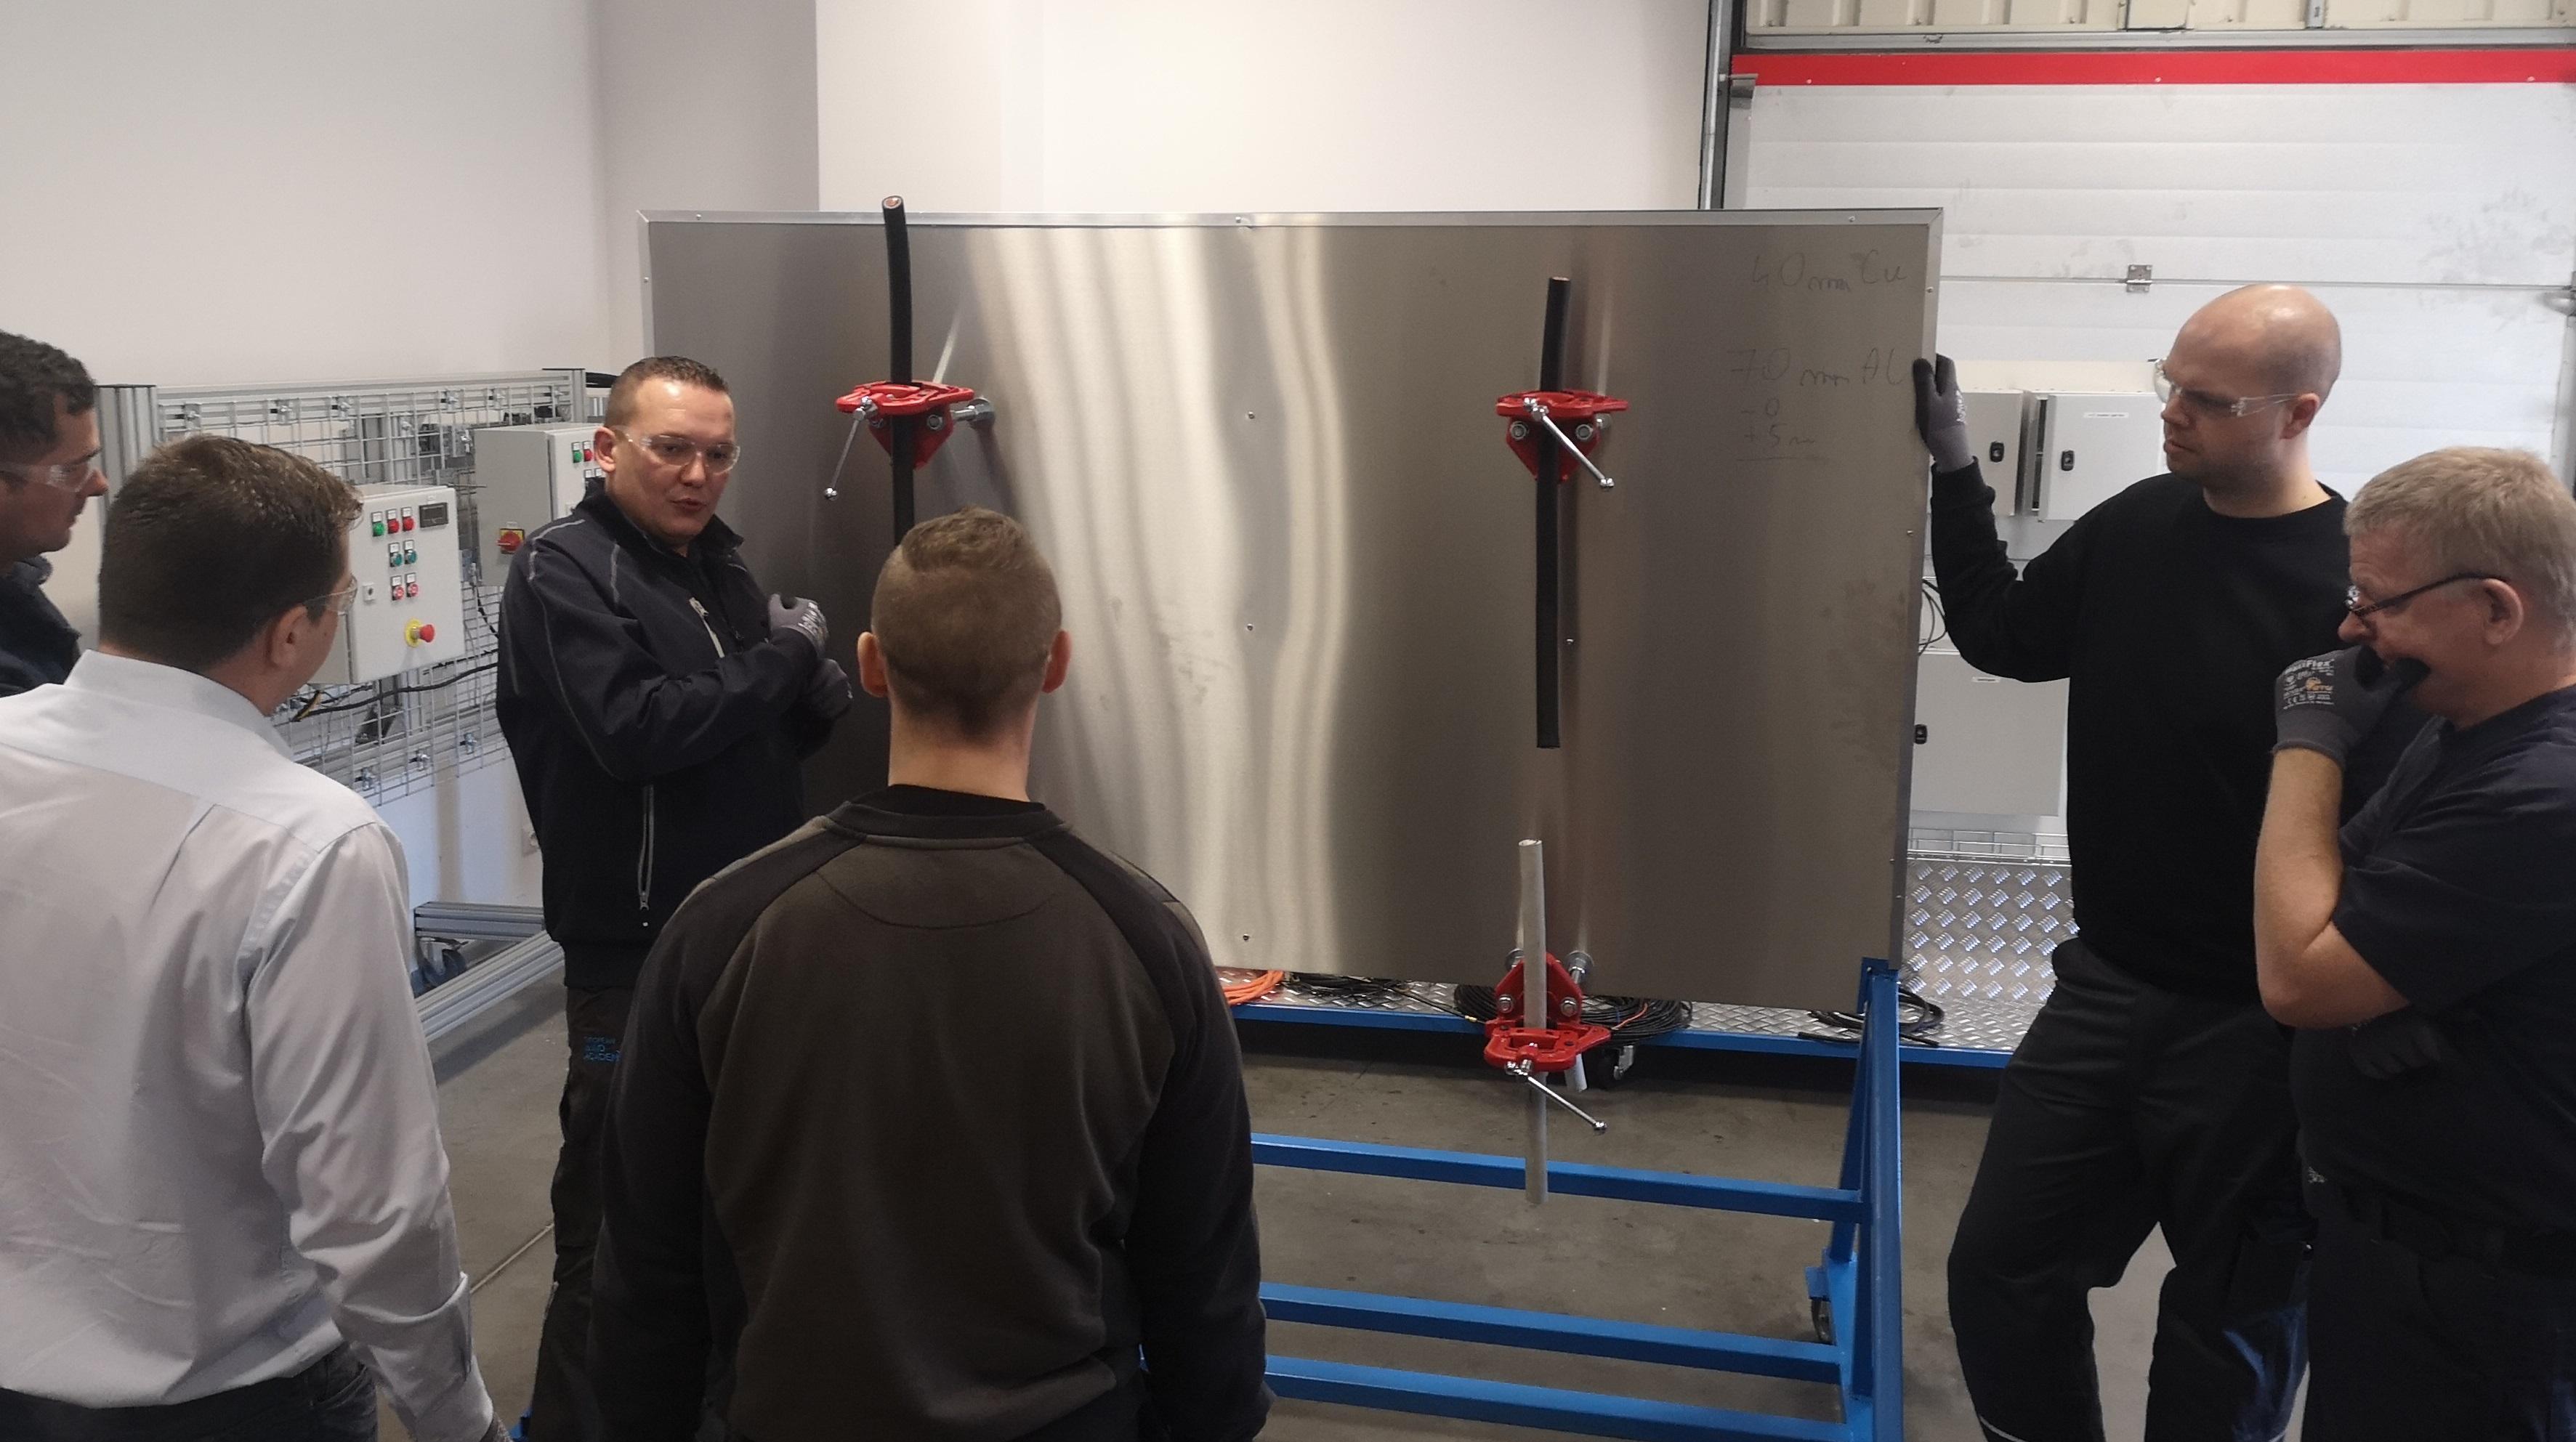 Delegates follow their instructor during the BTT Installation Module pilot at European Wind Academy in Poland